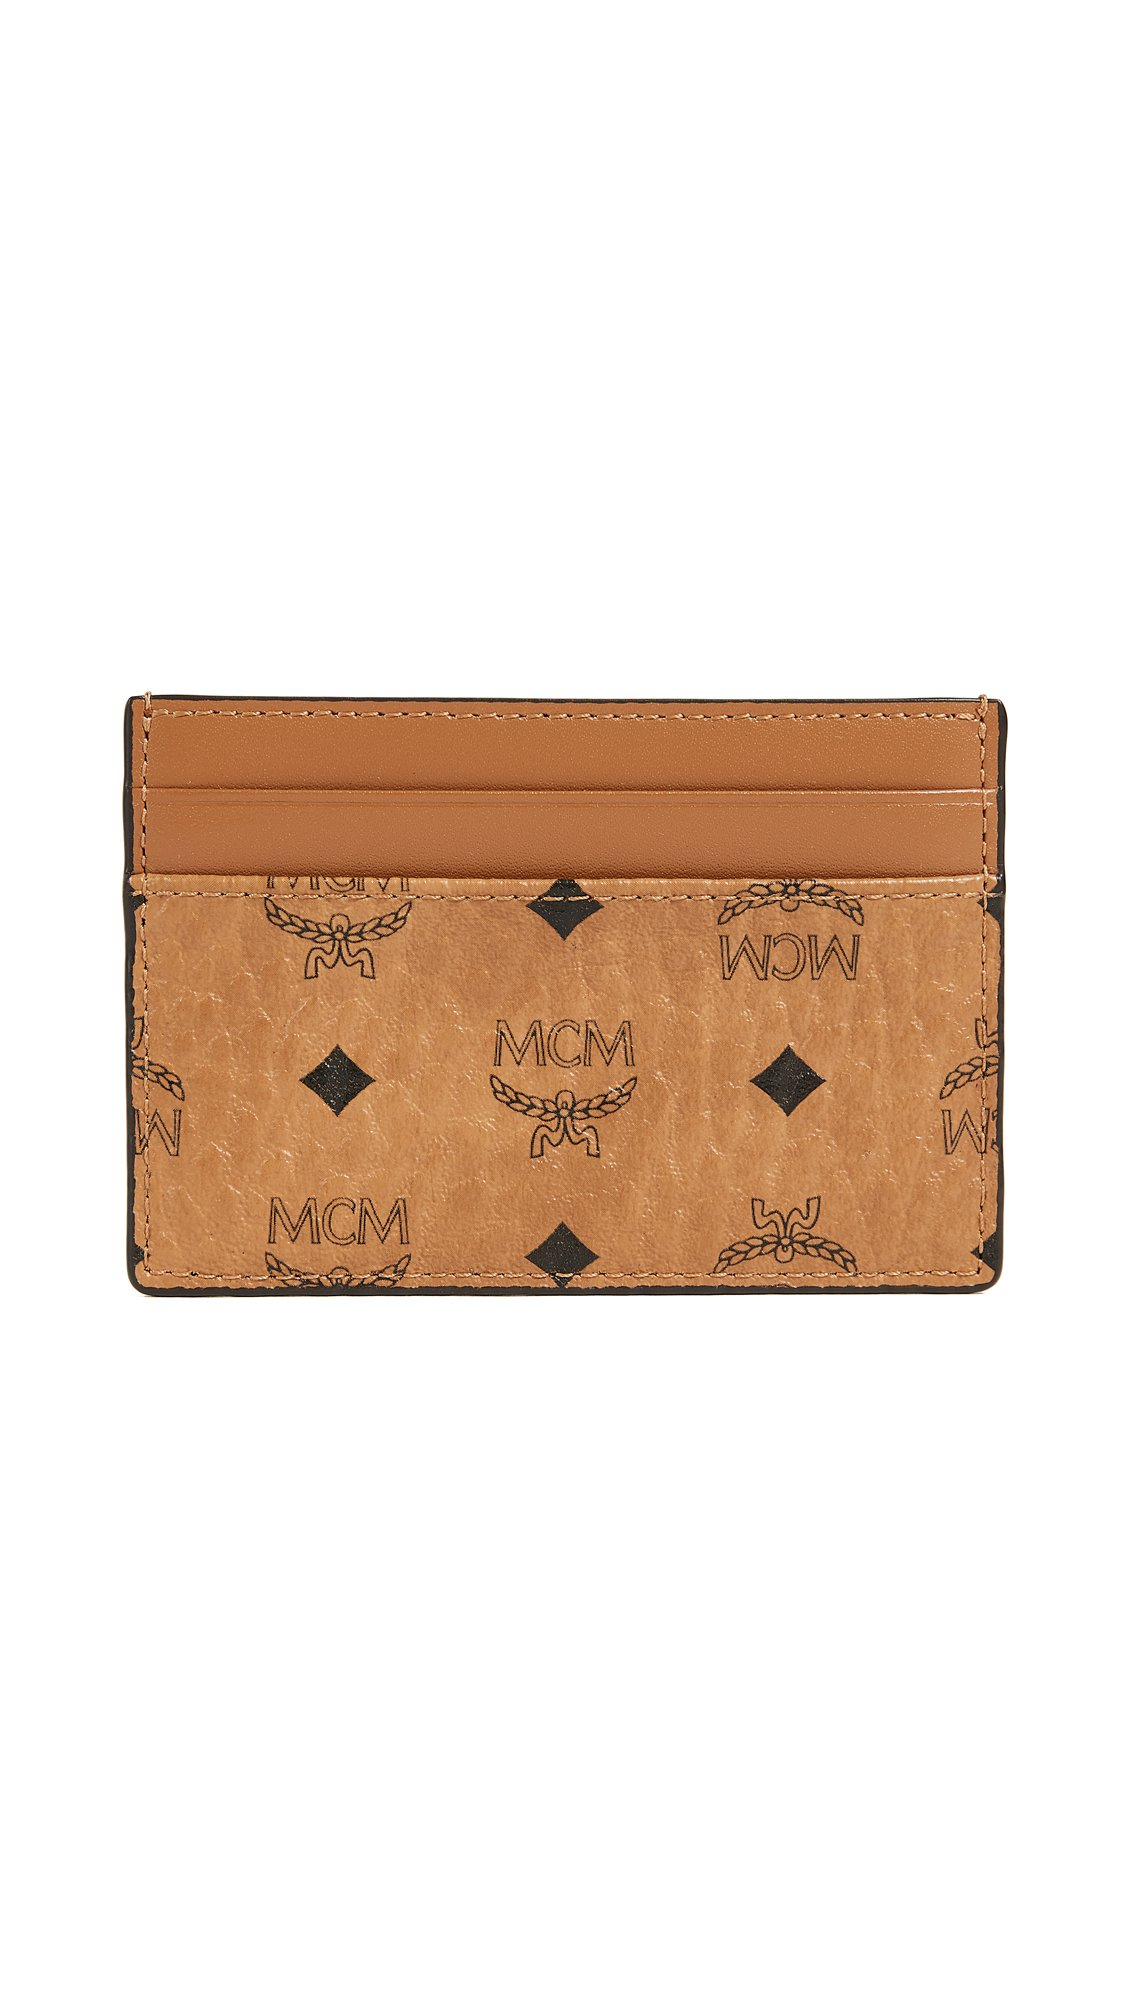 MCM Men's Visetos Card Case, Cognac, One Size